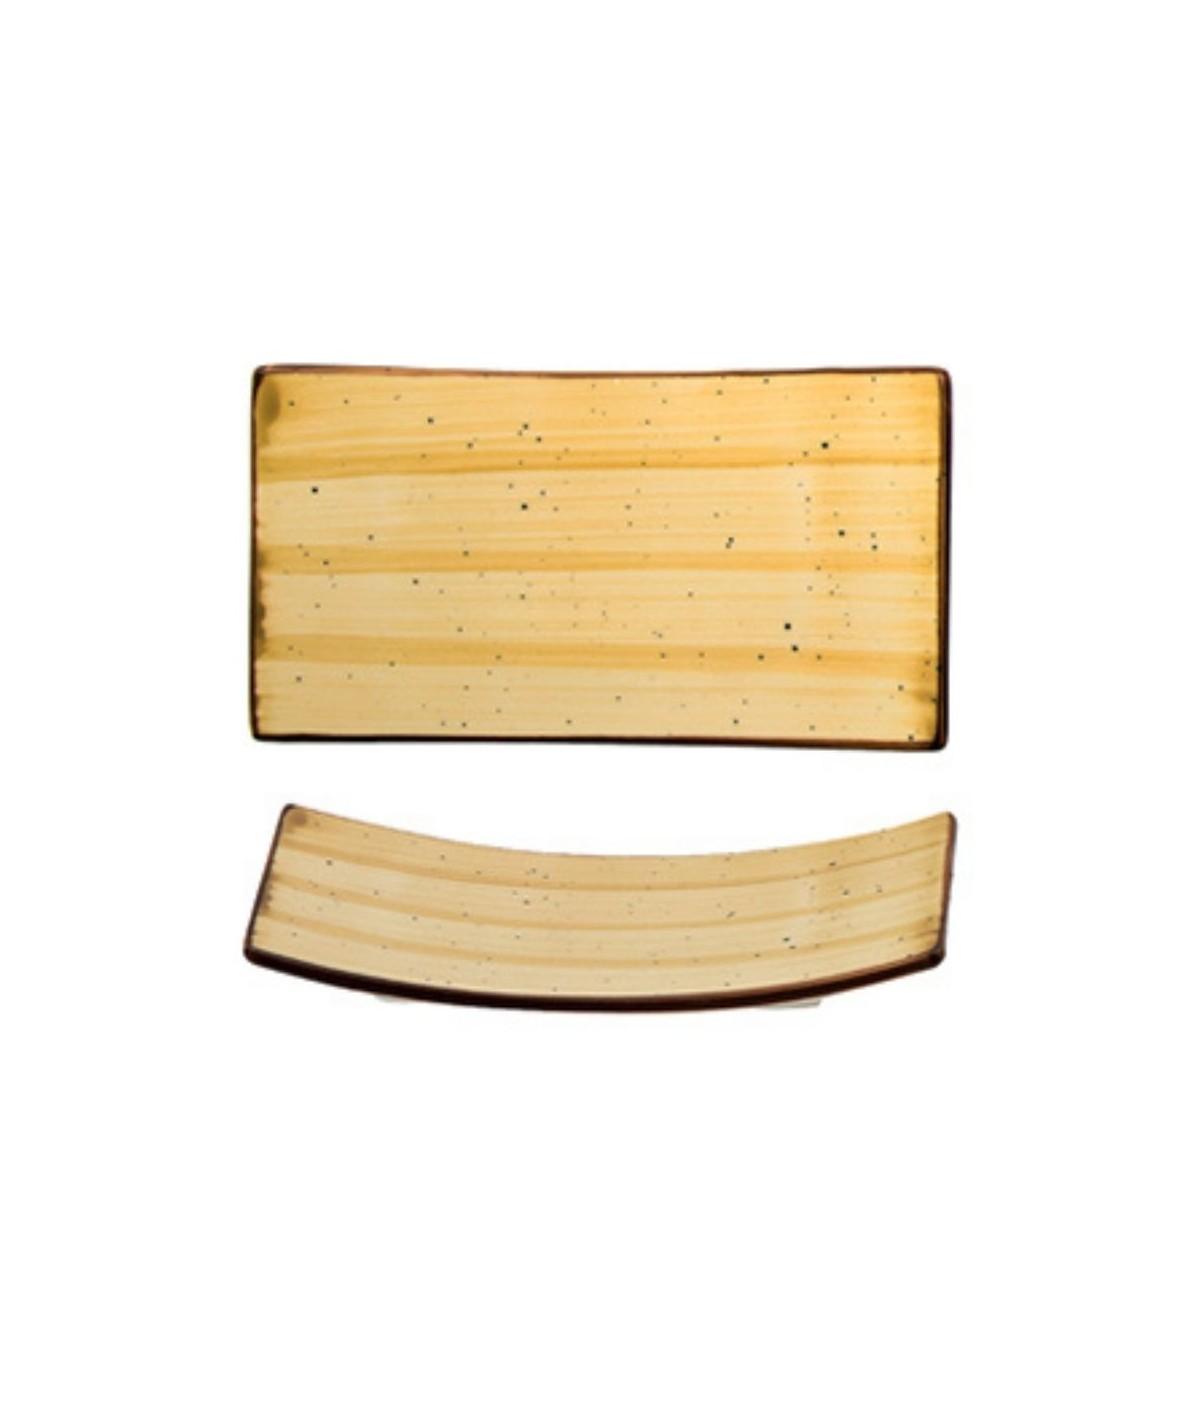 Vassoio rettangolare per salse o aperitivi ocra set 6 pezzi -